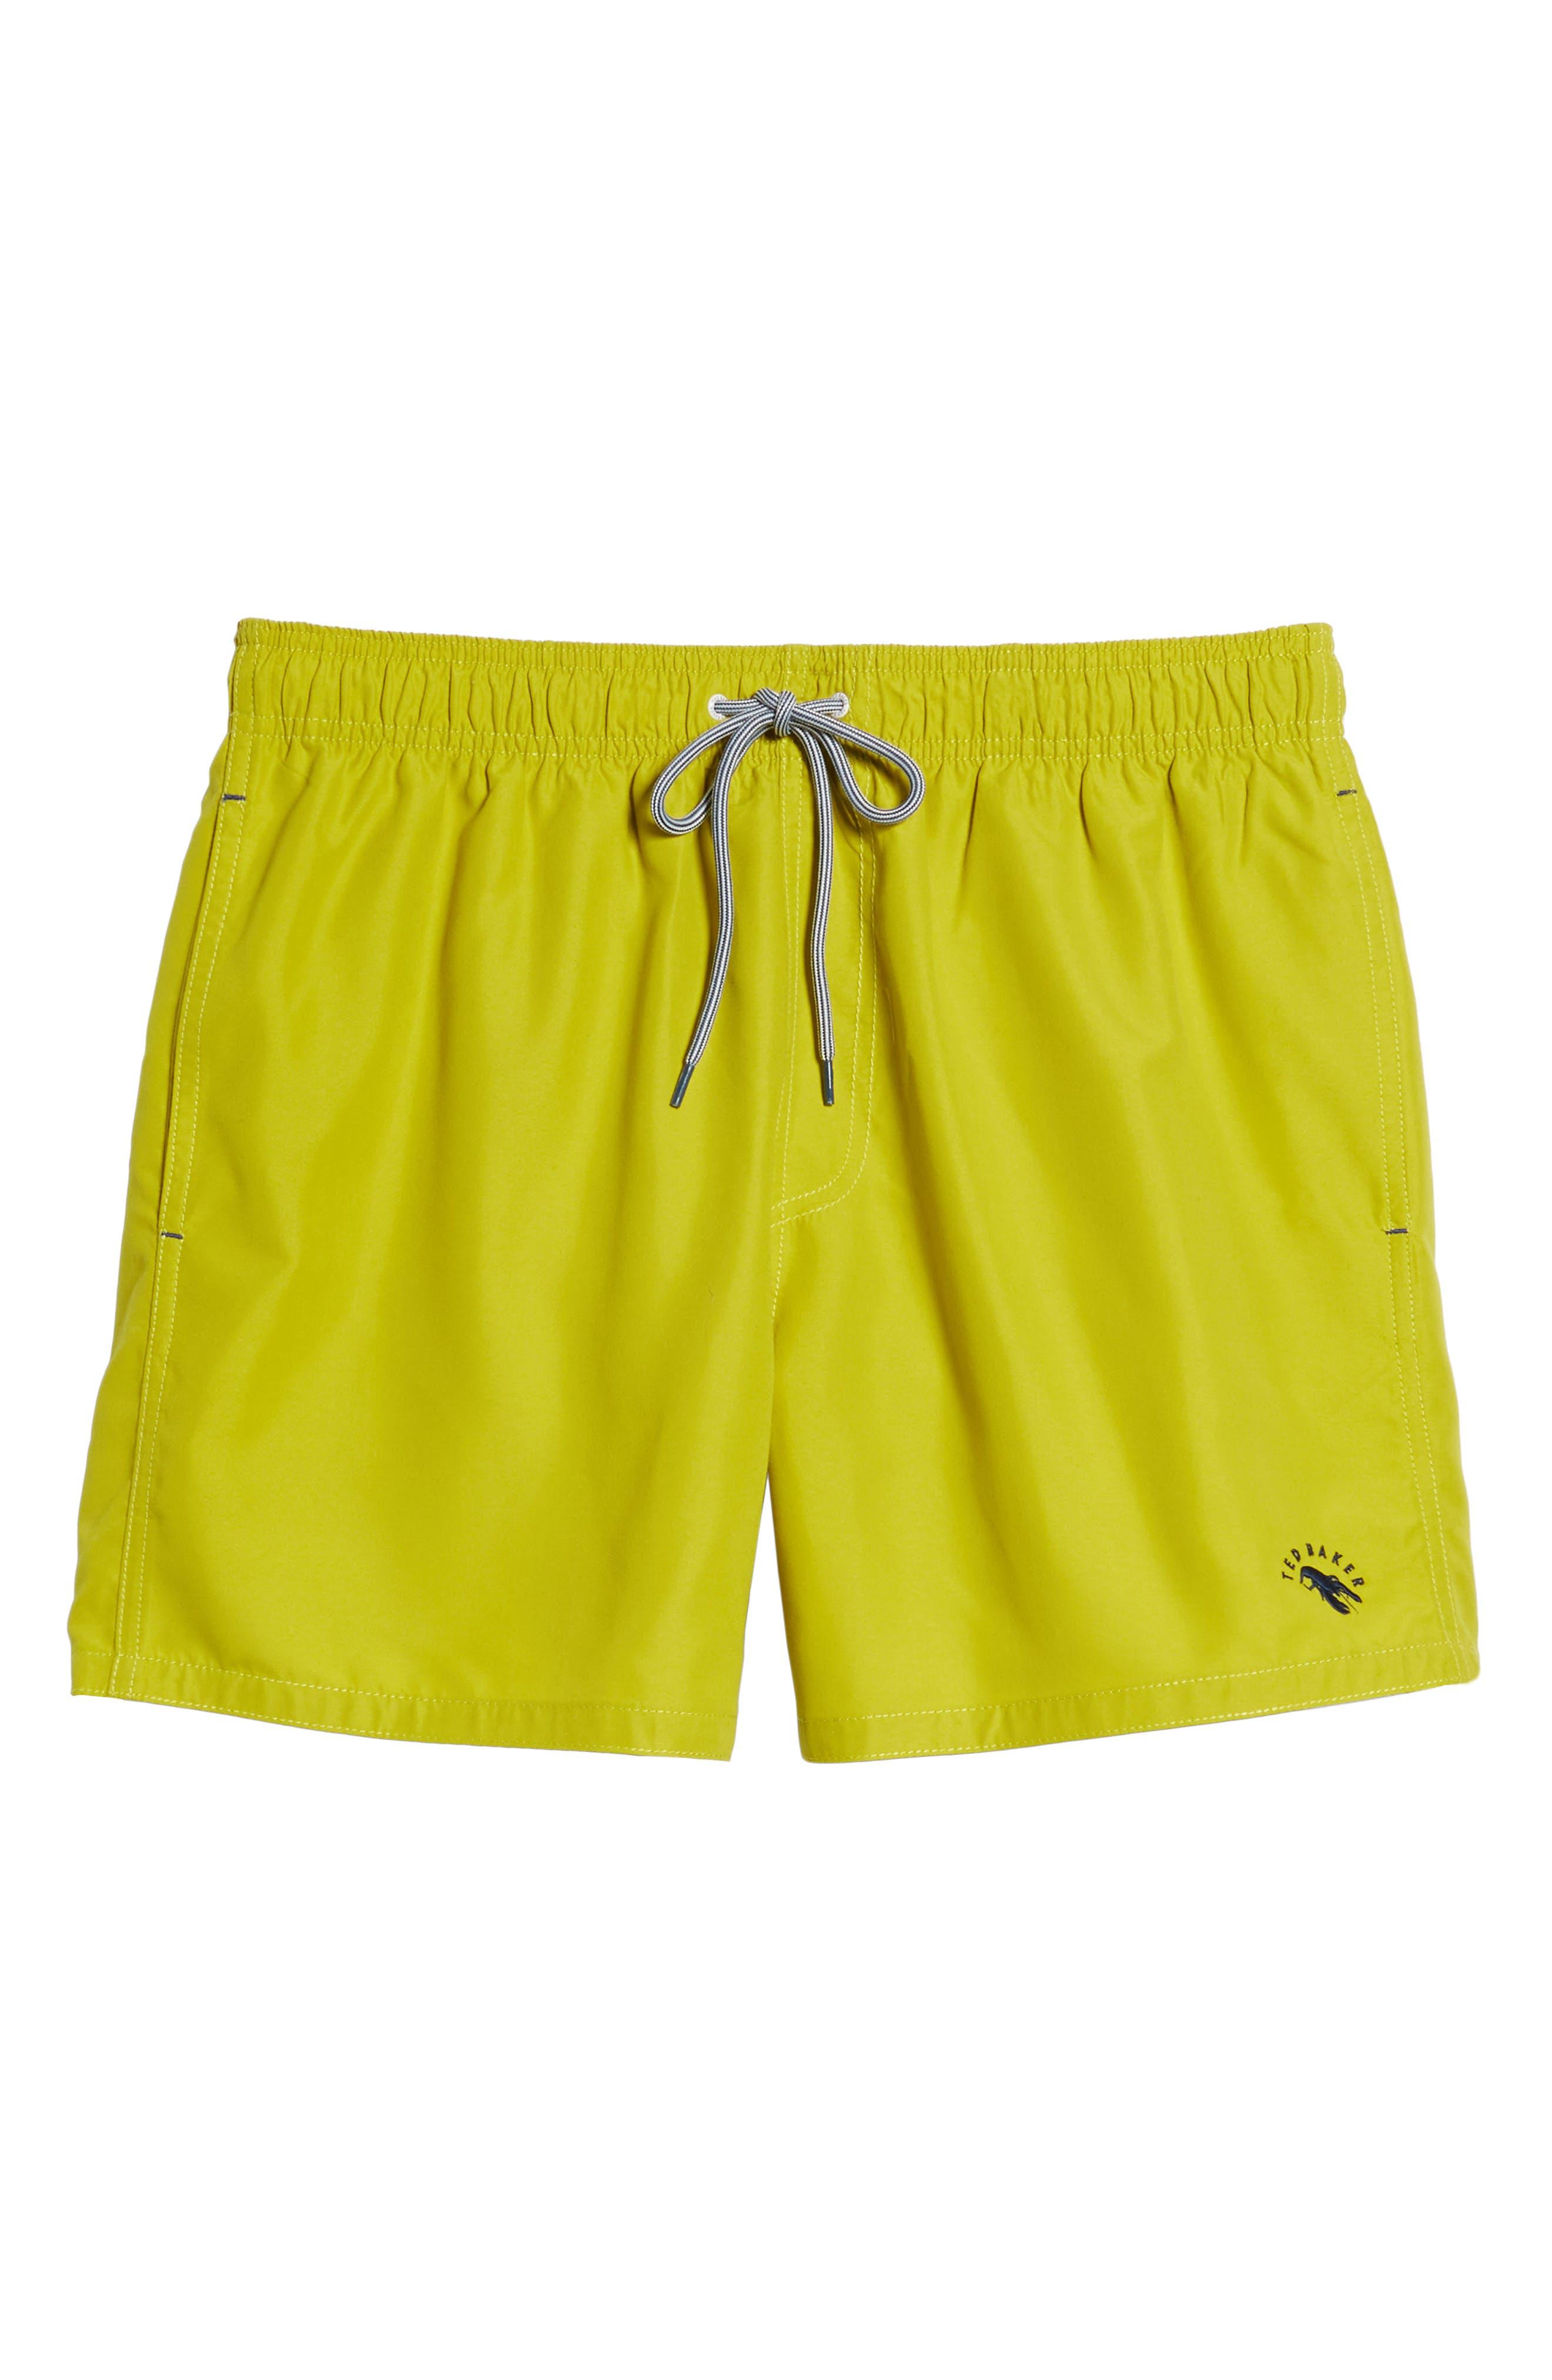 Danbury Swim Shorts,                             Alternate thumbnail 6, color,                             303